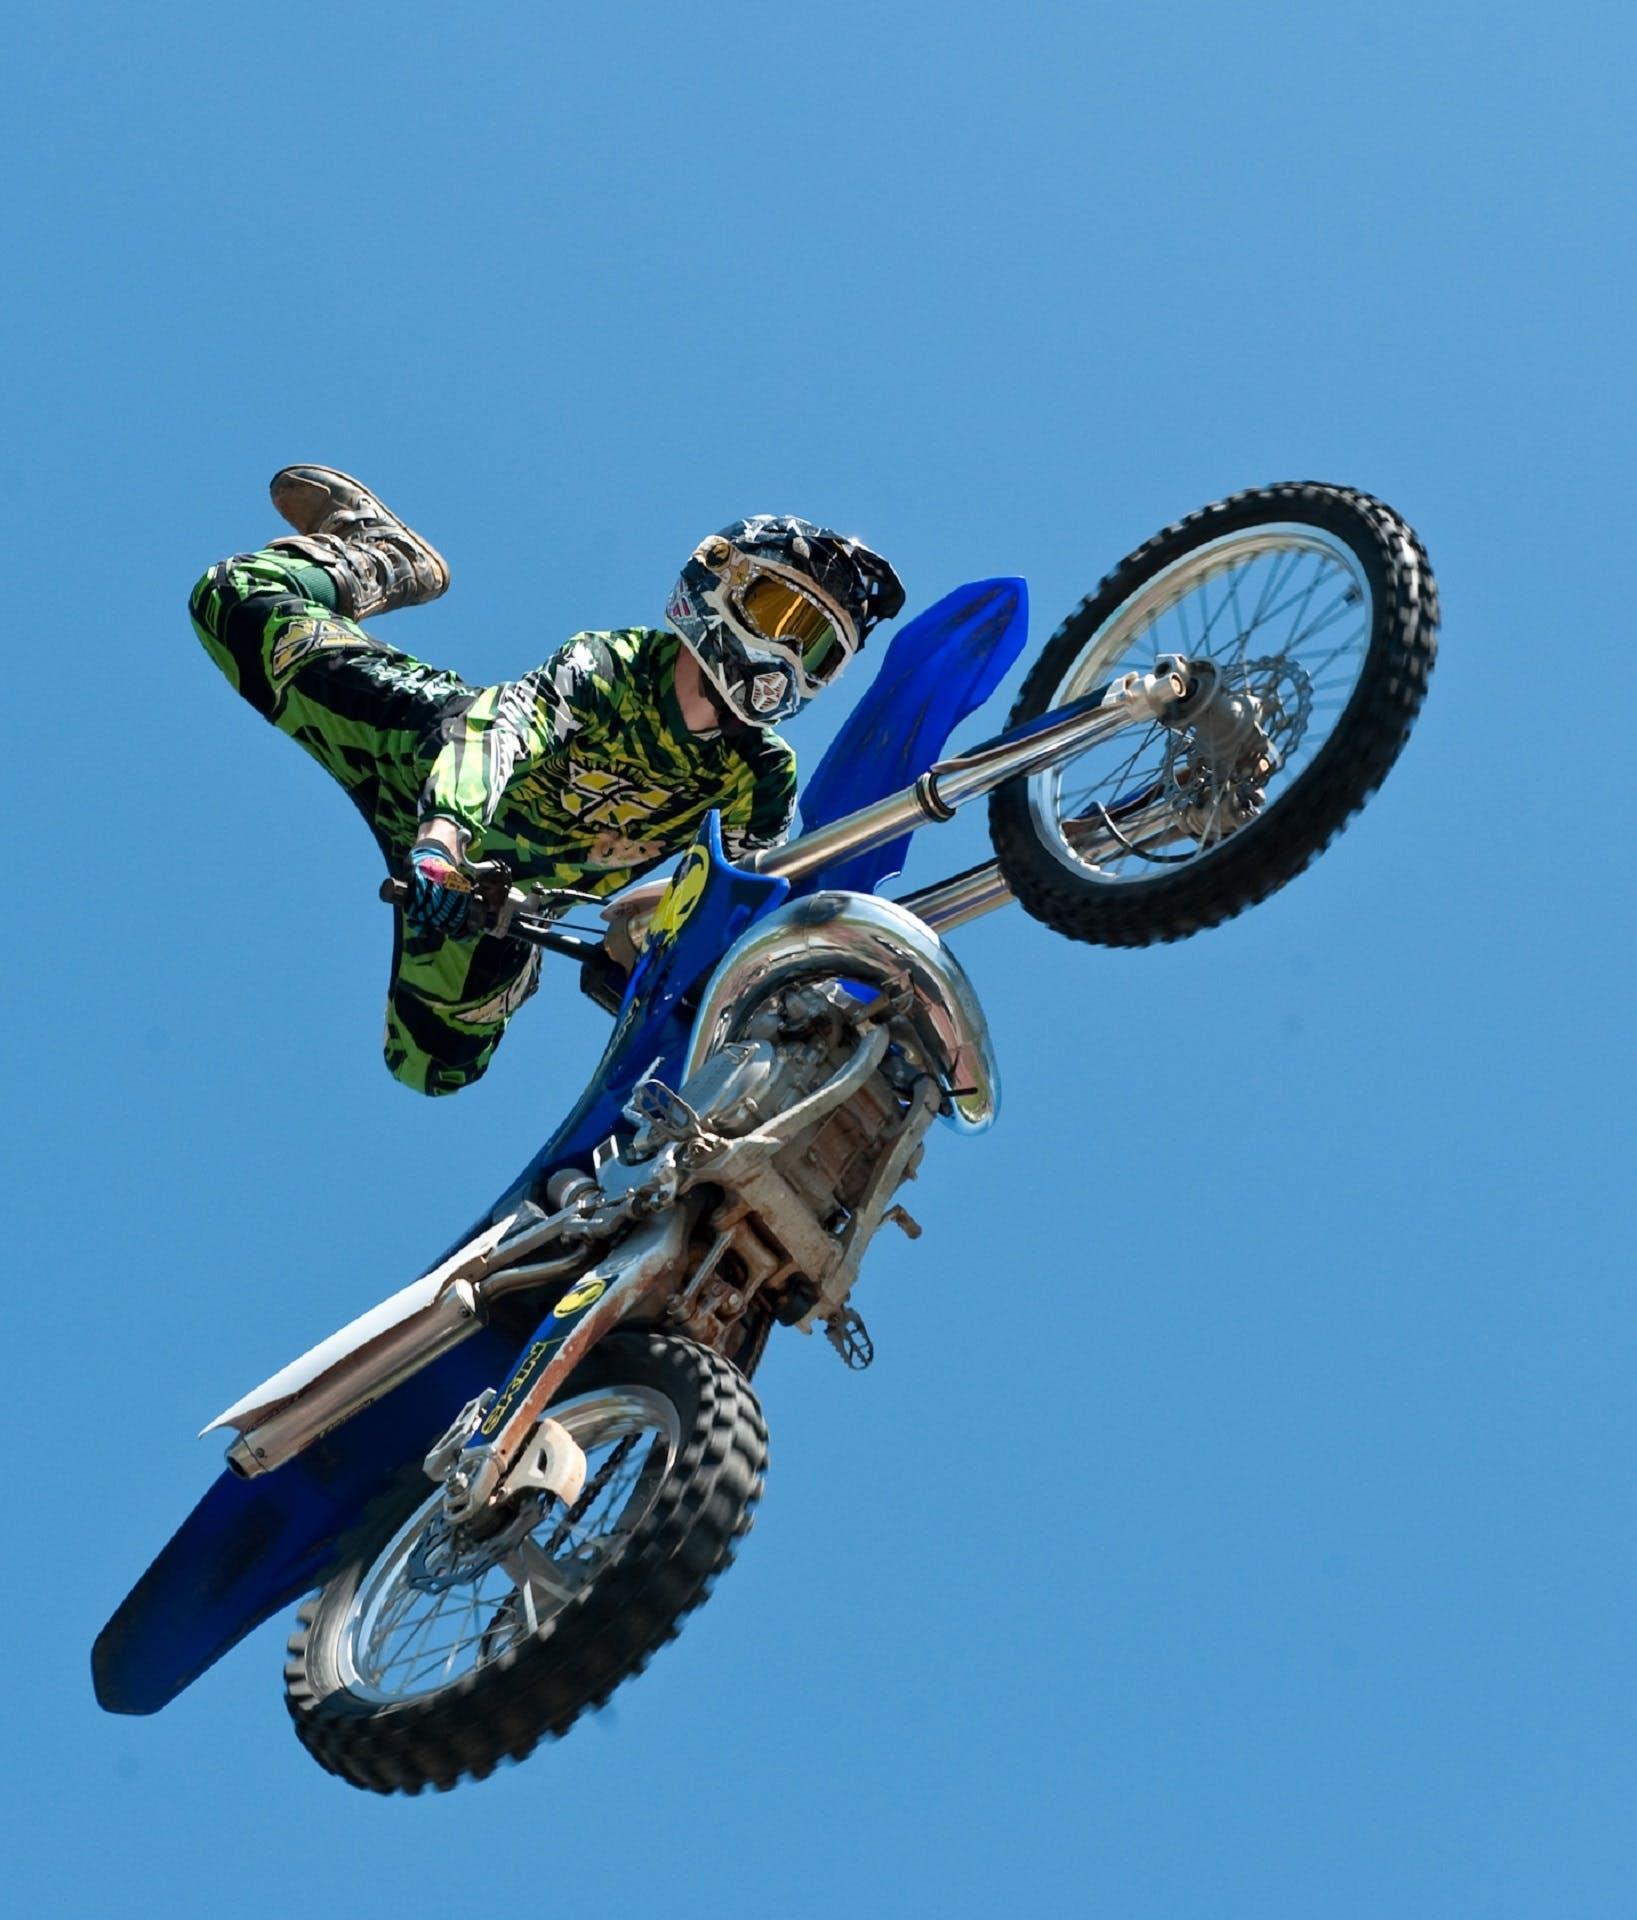 Man Riding Blue Dirt Bike